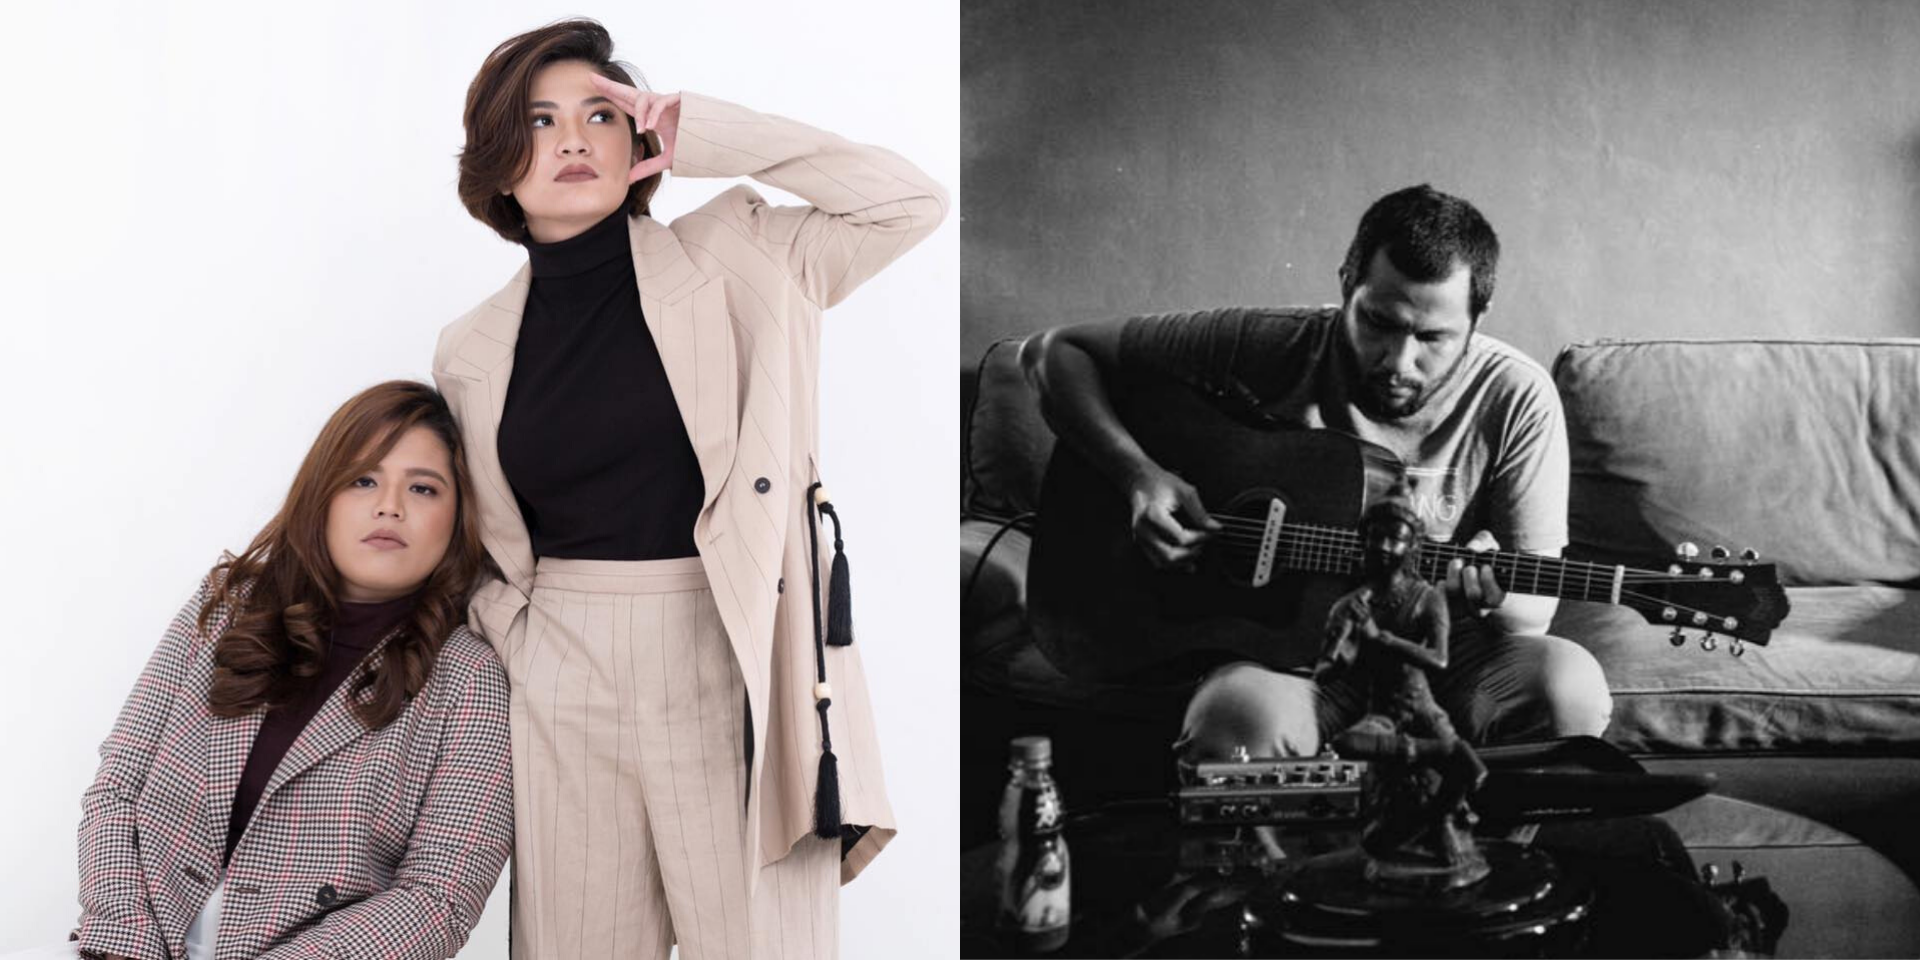 Leanne & Naara enlist Johnoy Danao for new single, 'Evergreen' – listen